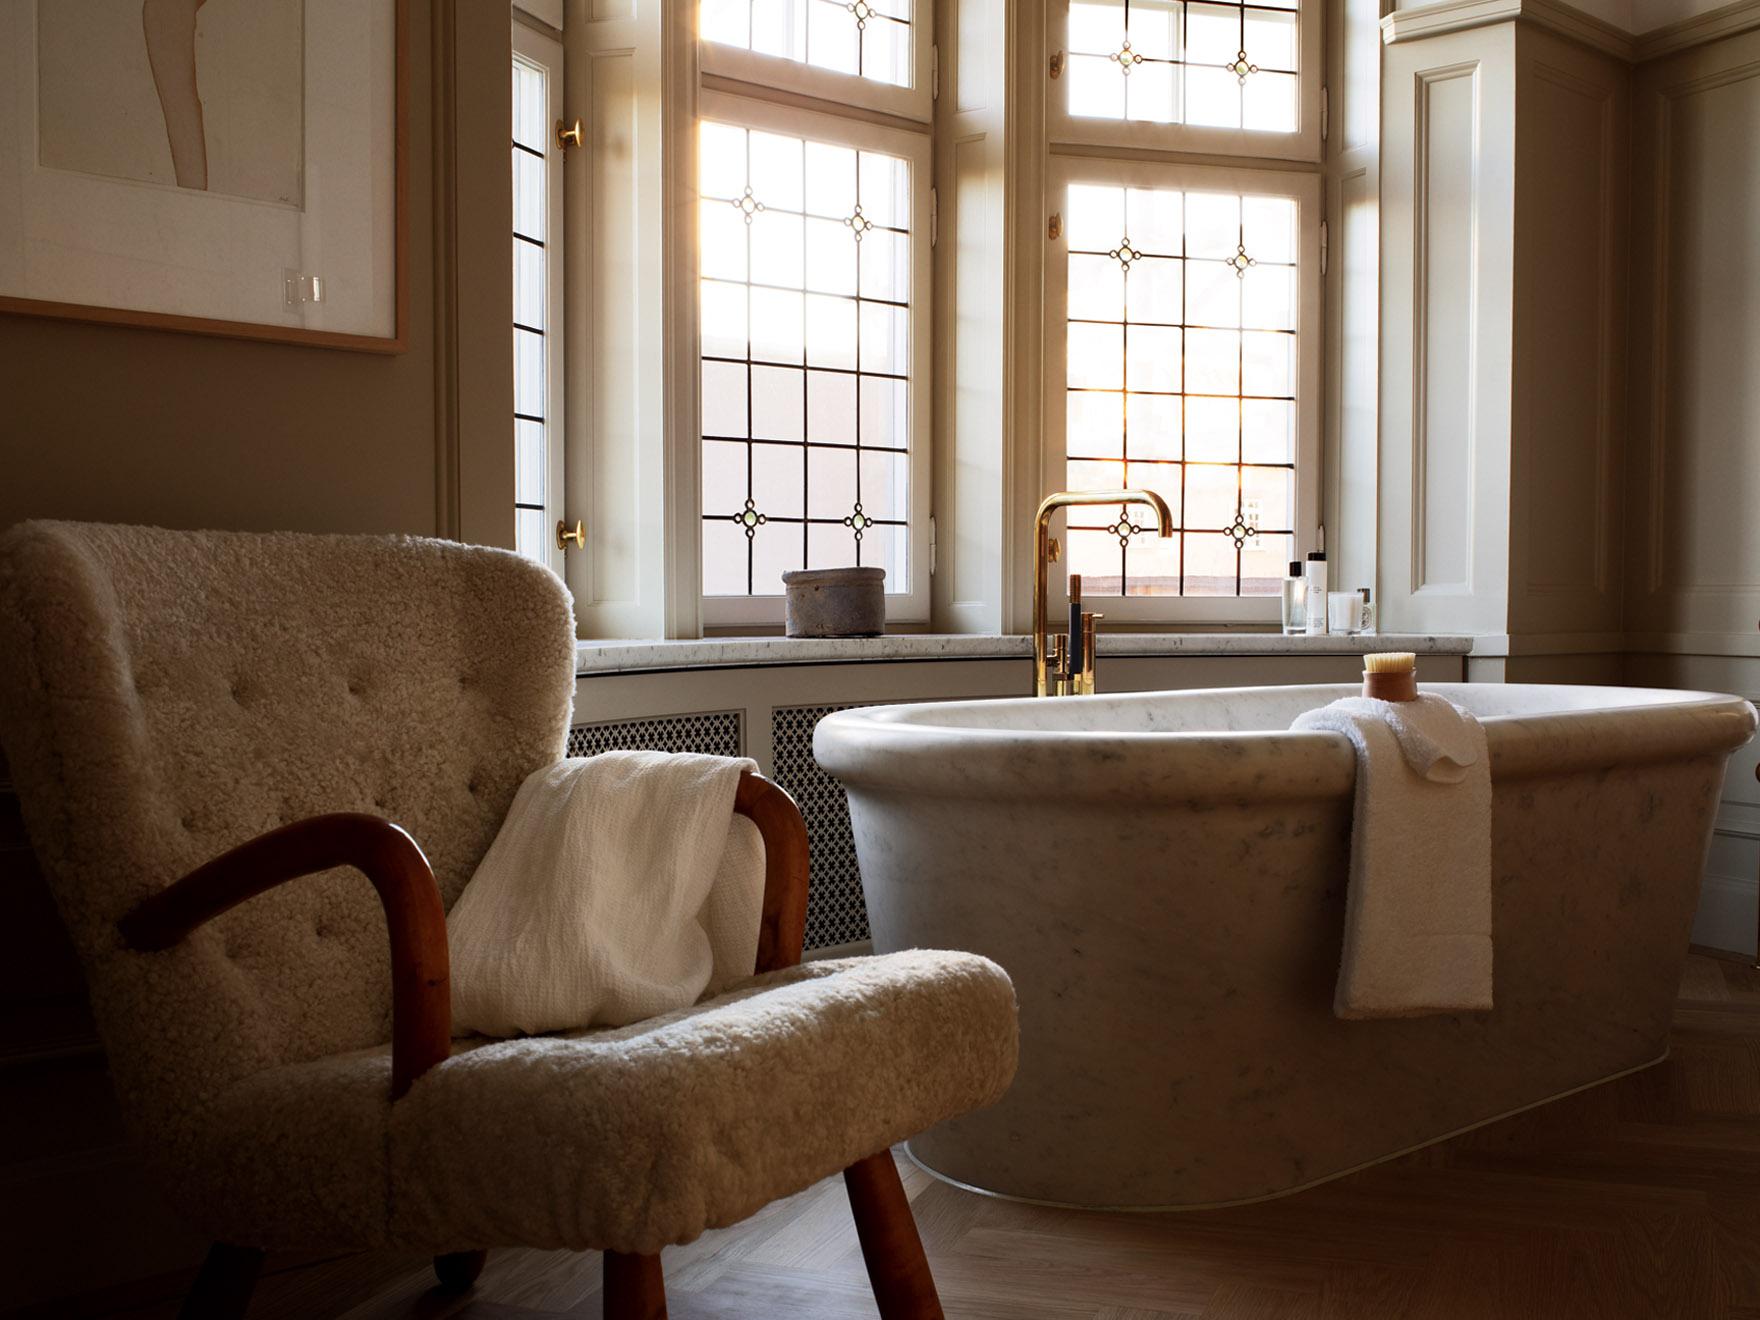 badrum-inspiration_kalksten-massing_ett-hem_suite_badrumsdrommar